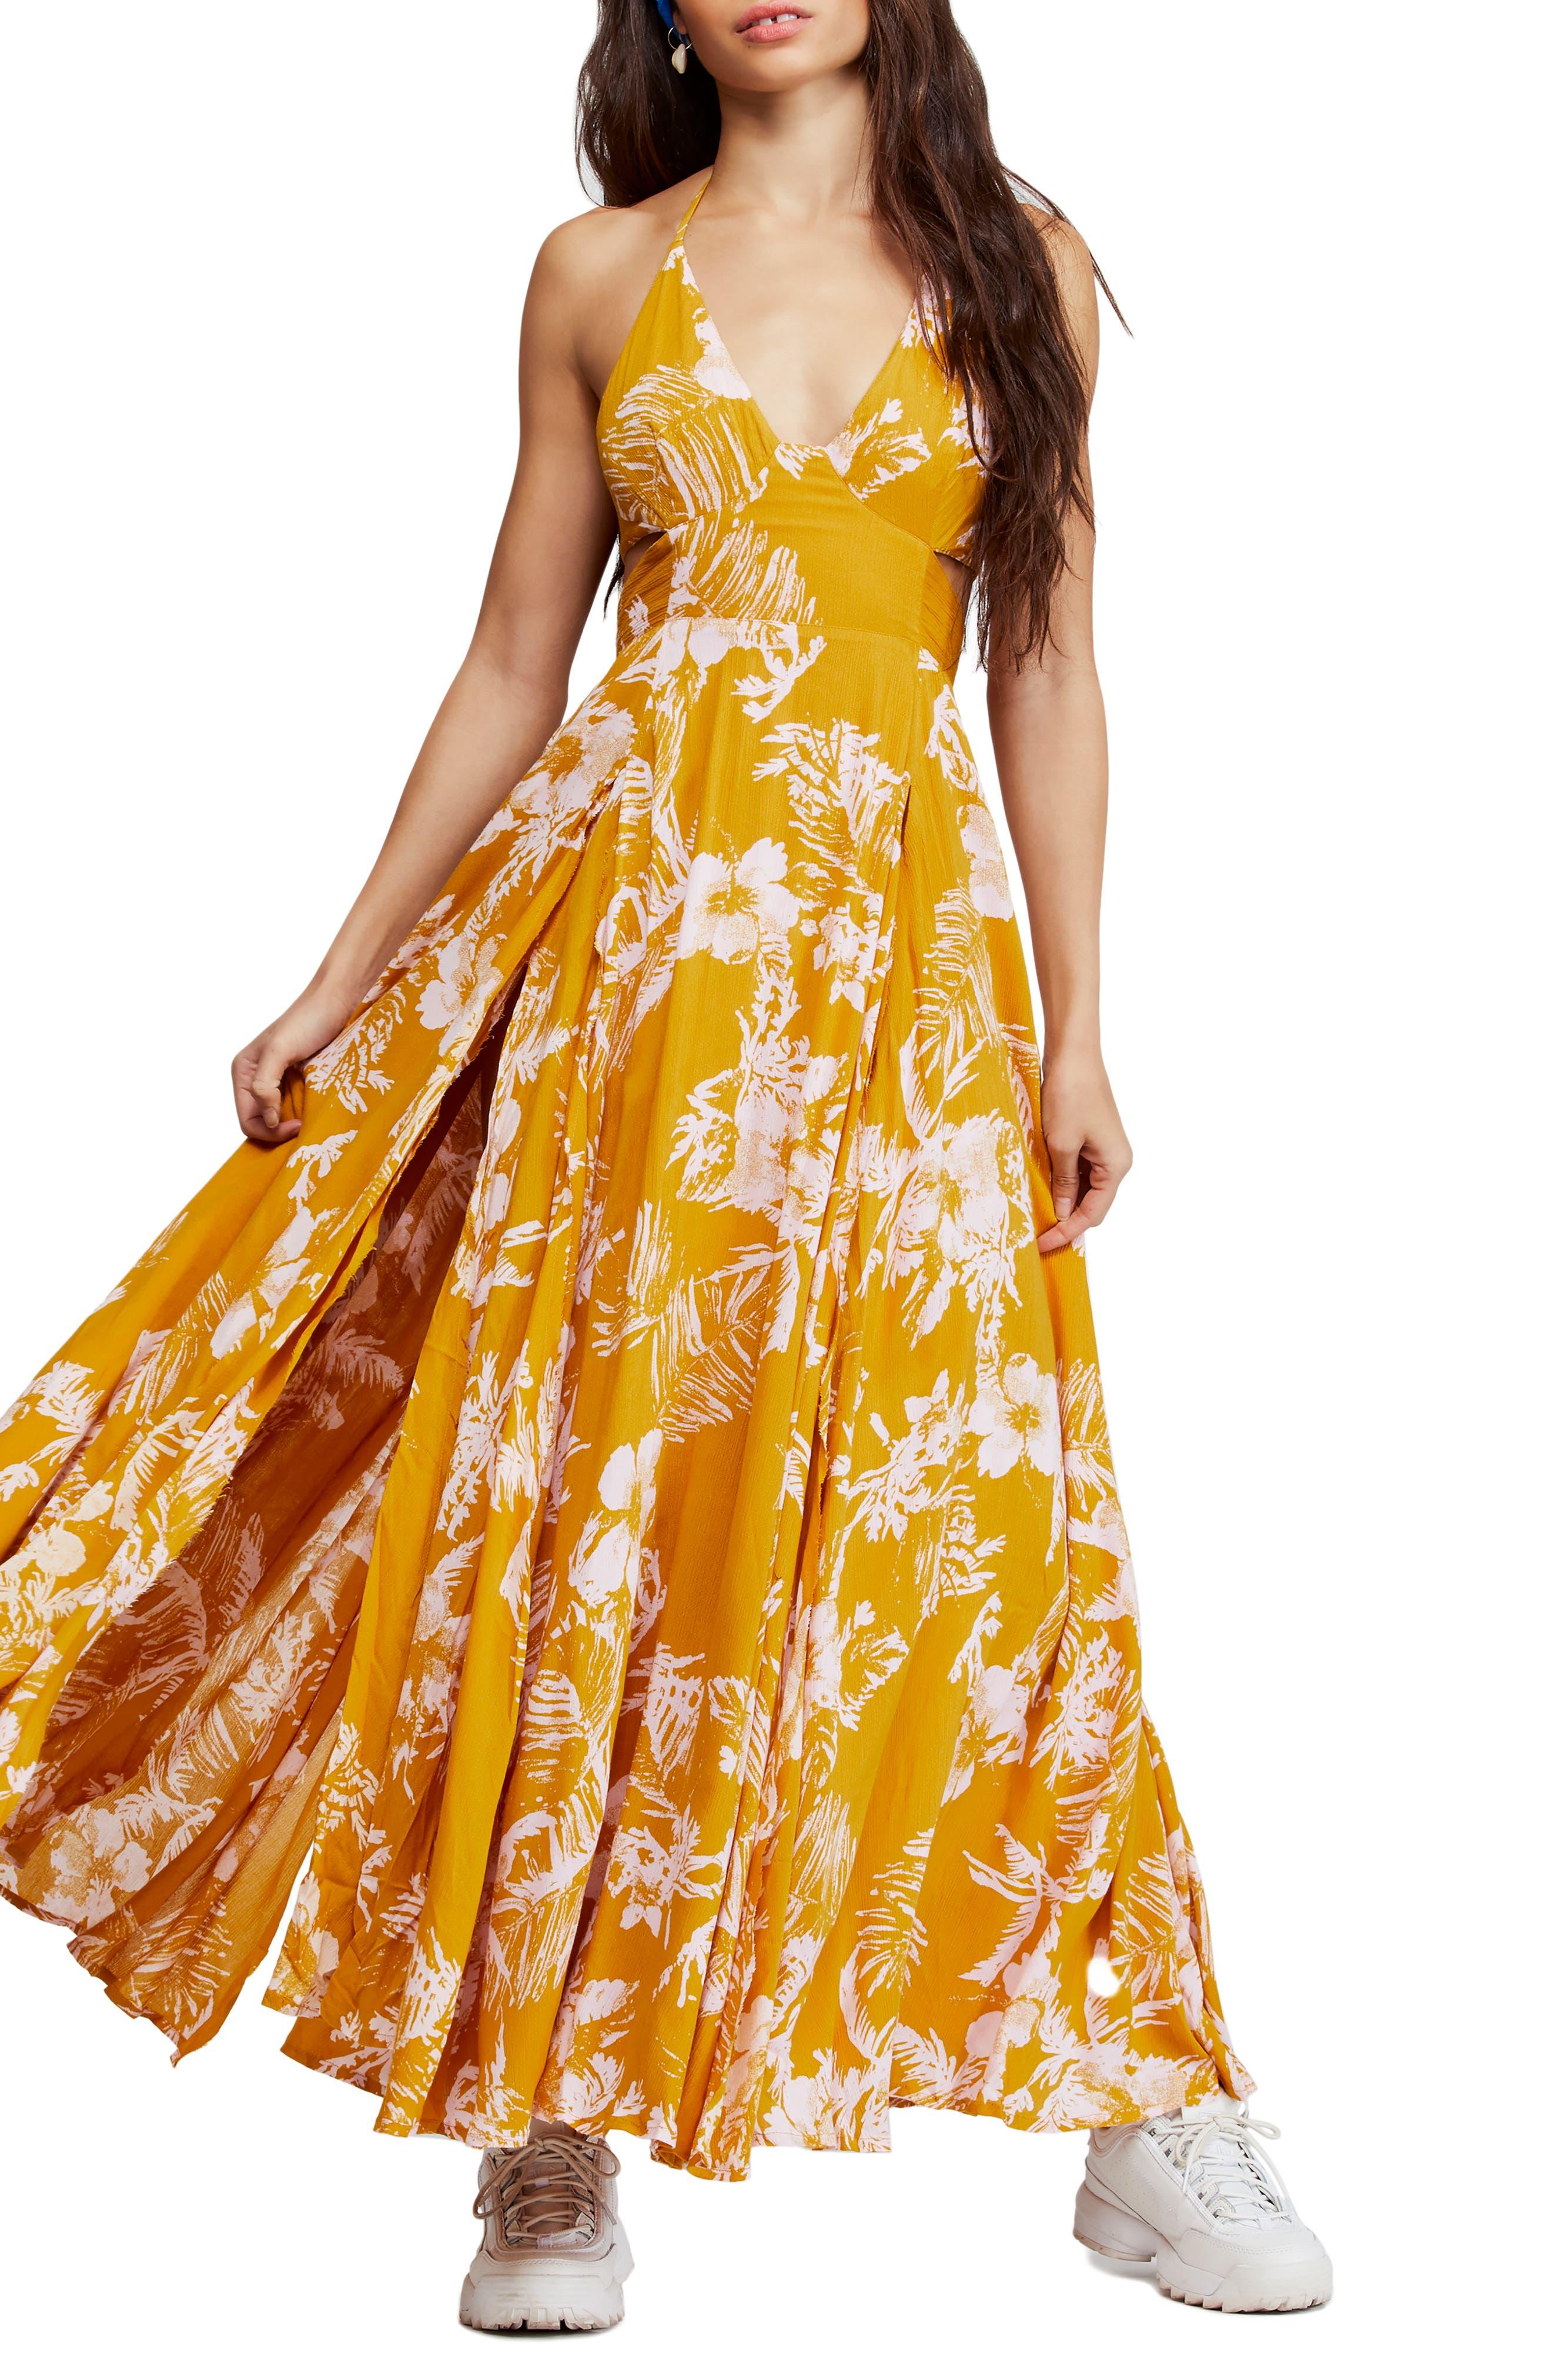 Free People Lille Print Maxi Dress, Yellow